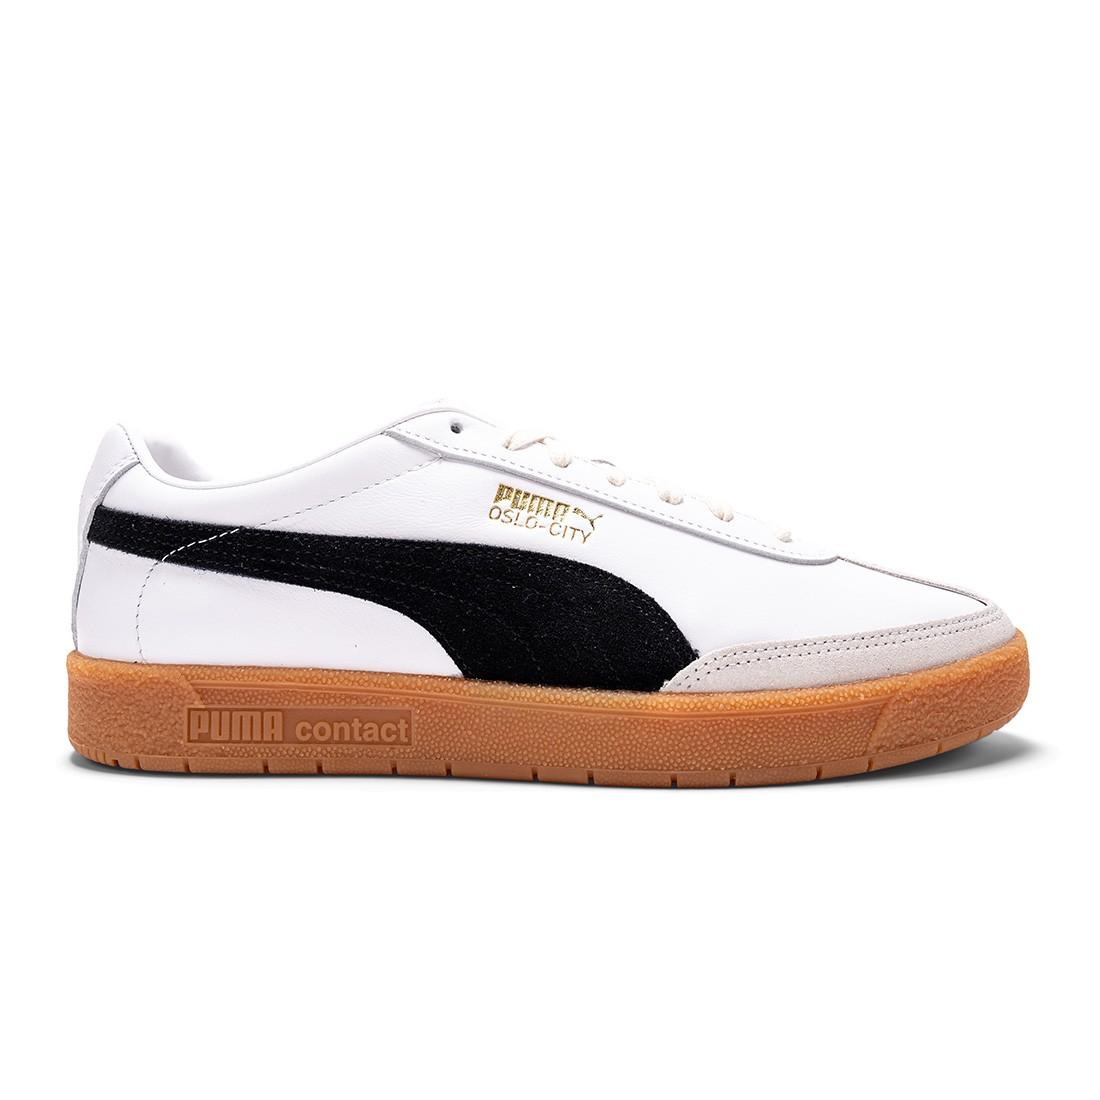 Puma Men Oslo City - OG (white / black / gum)